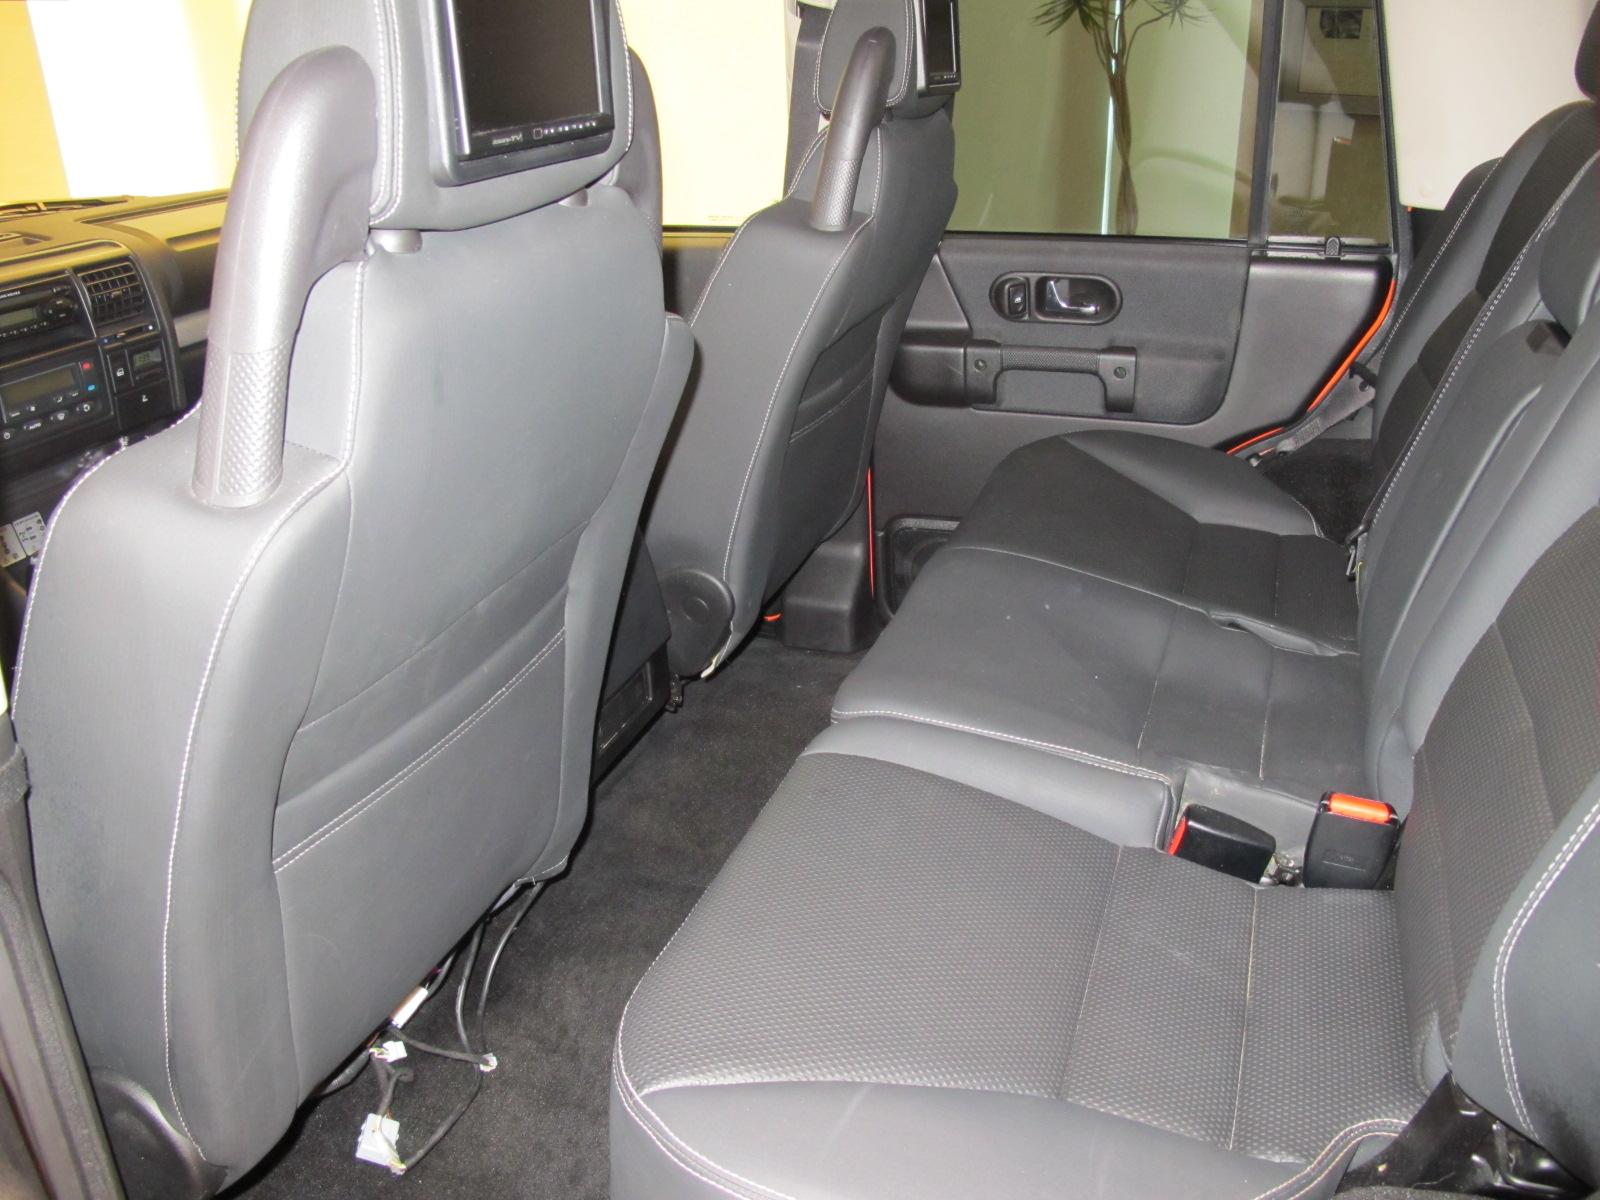 2004 Land Rover G4 SOLD jlr classics